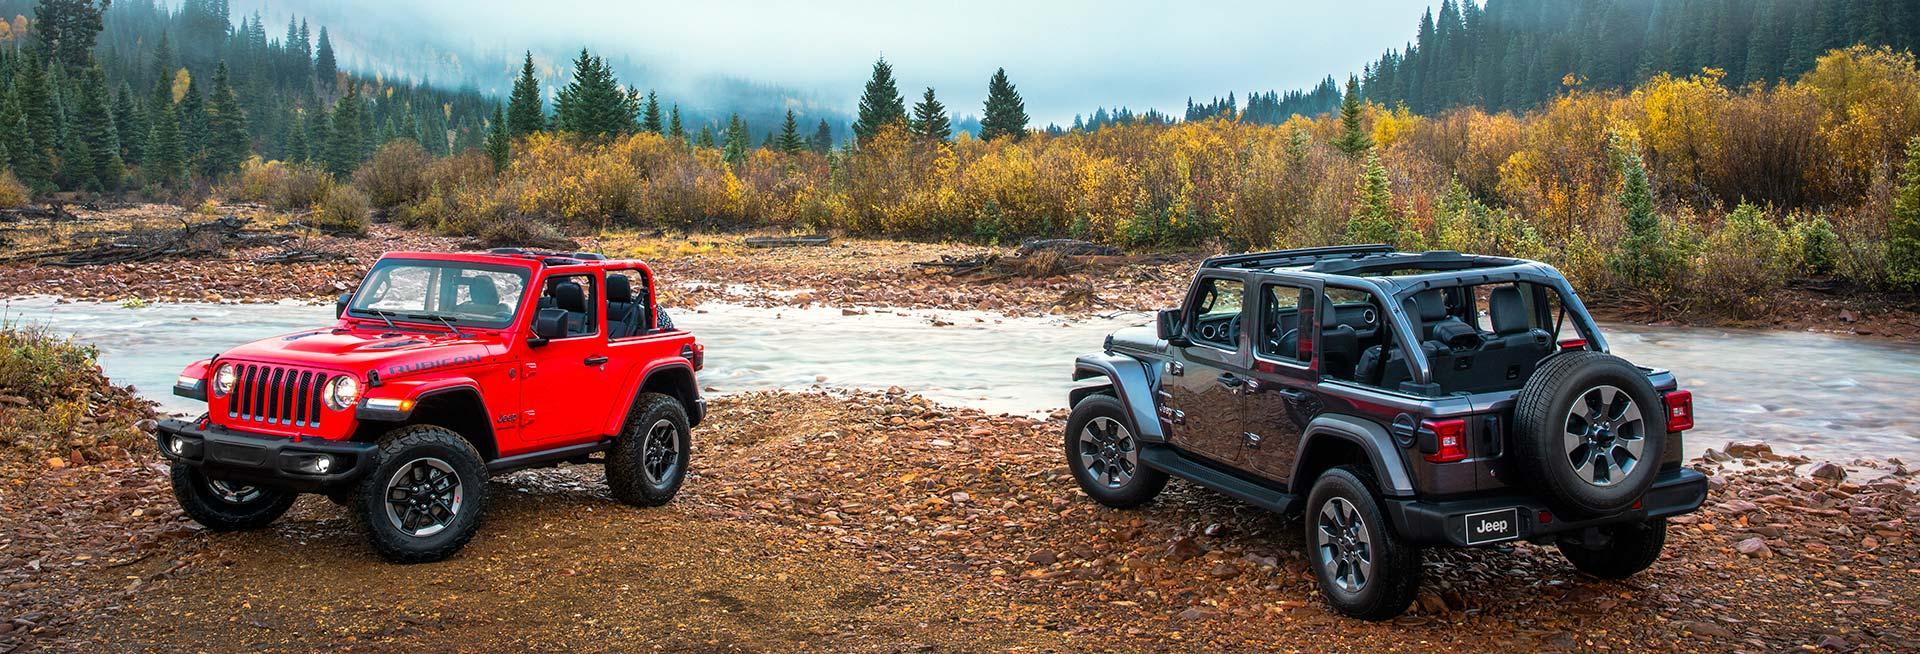 2018 Jeep Wrangler Lease Deals And Specials Nj